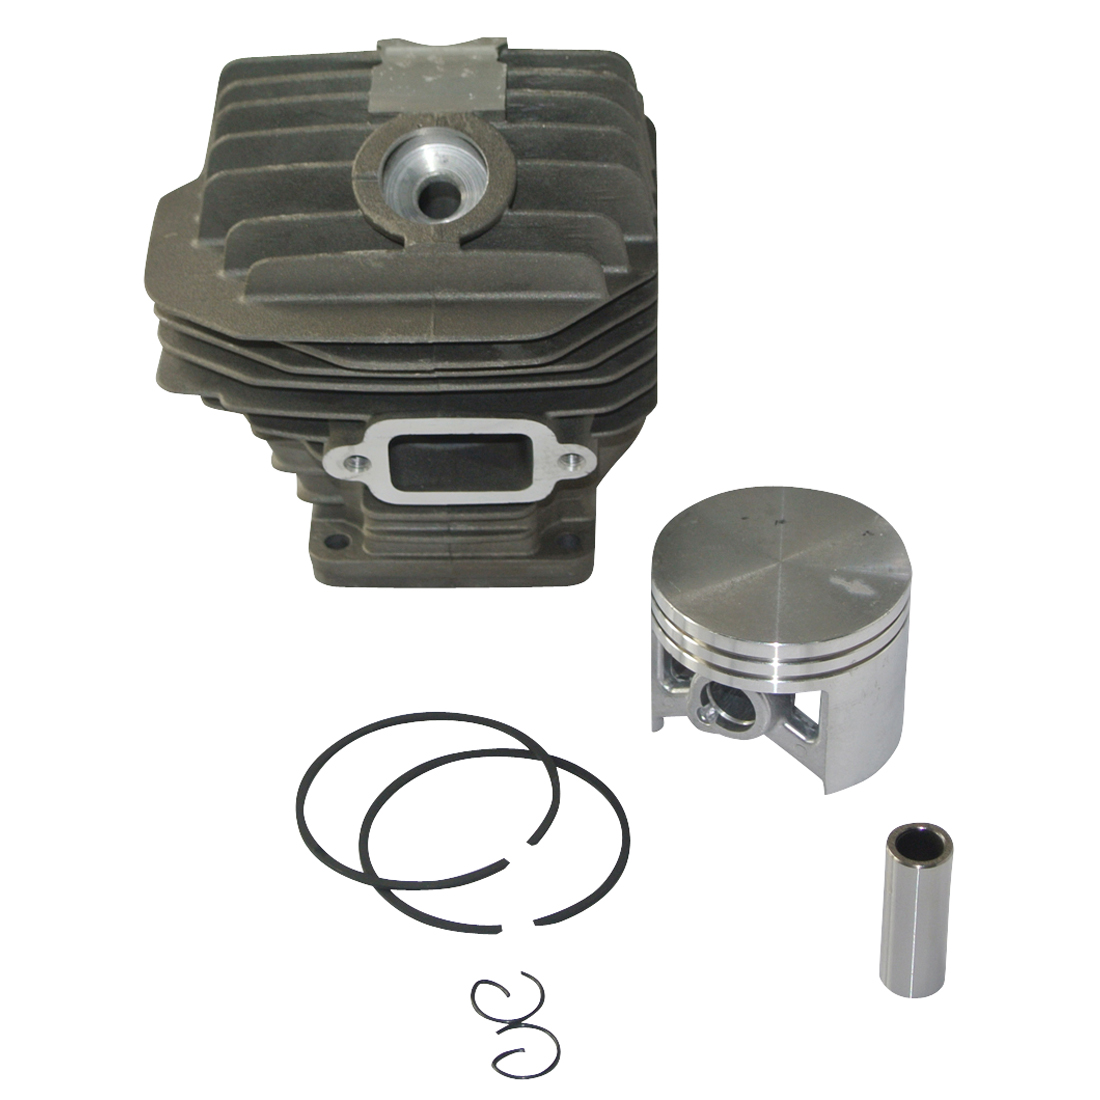 Nikasil 50MM Cylinder Piston Ring Kit Fit STIHL 044 MS440 Chainsaw 1128-020-1226